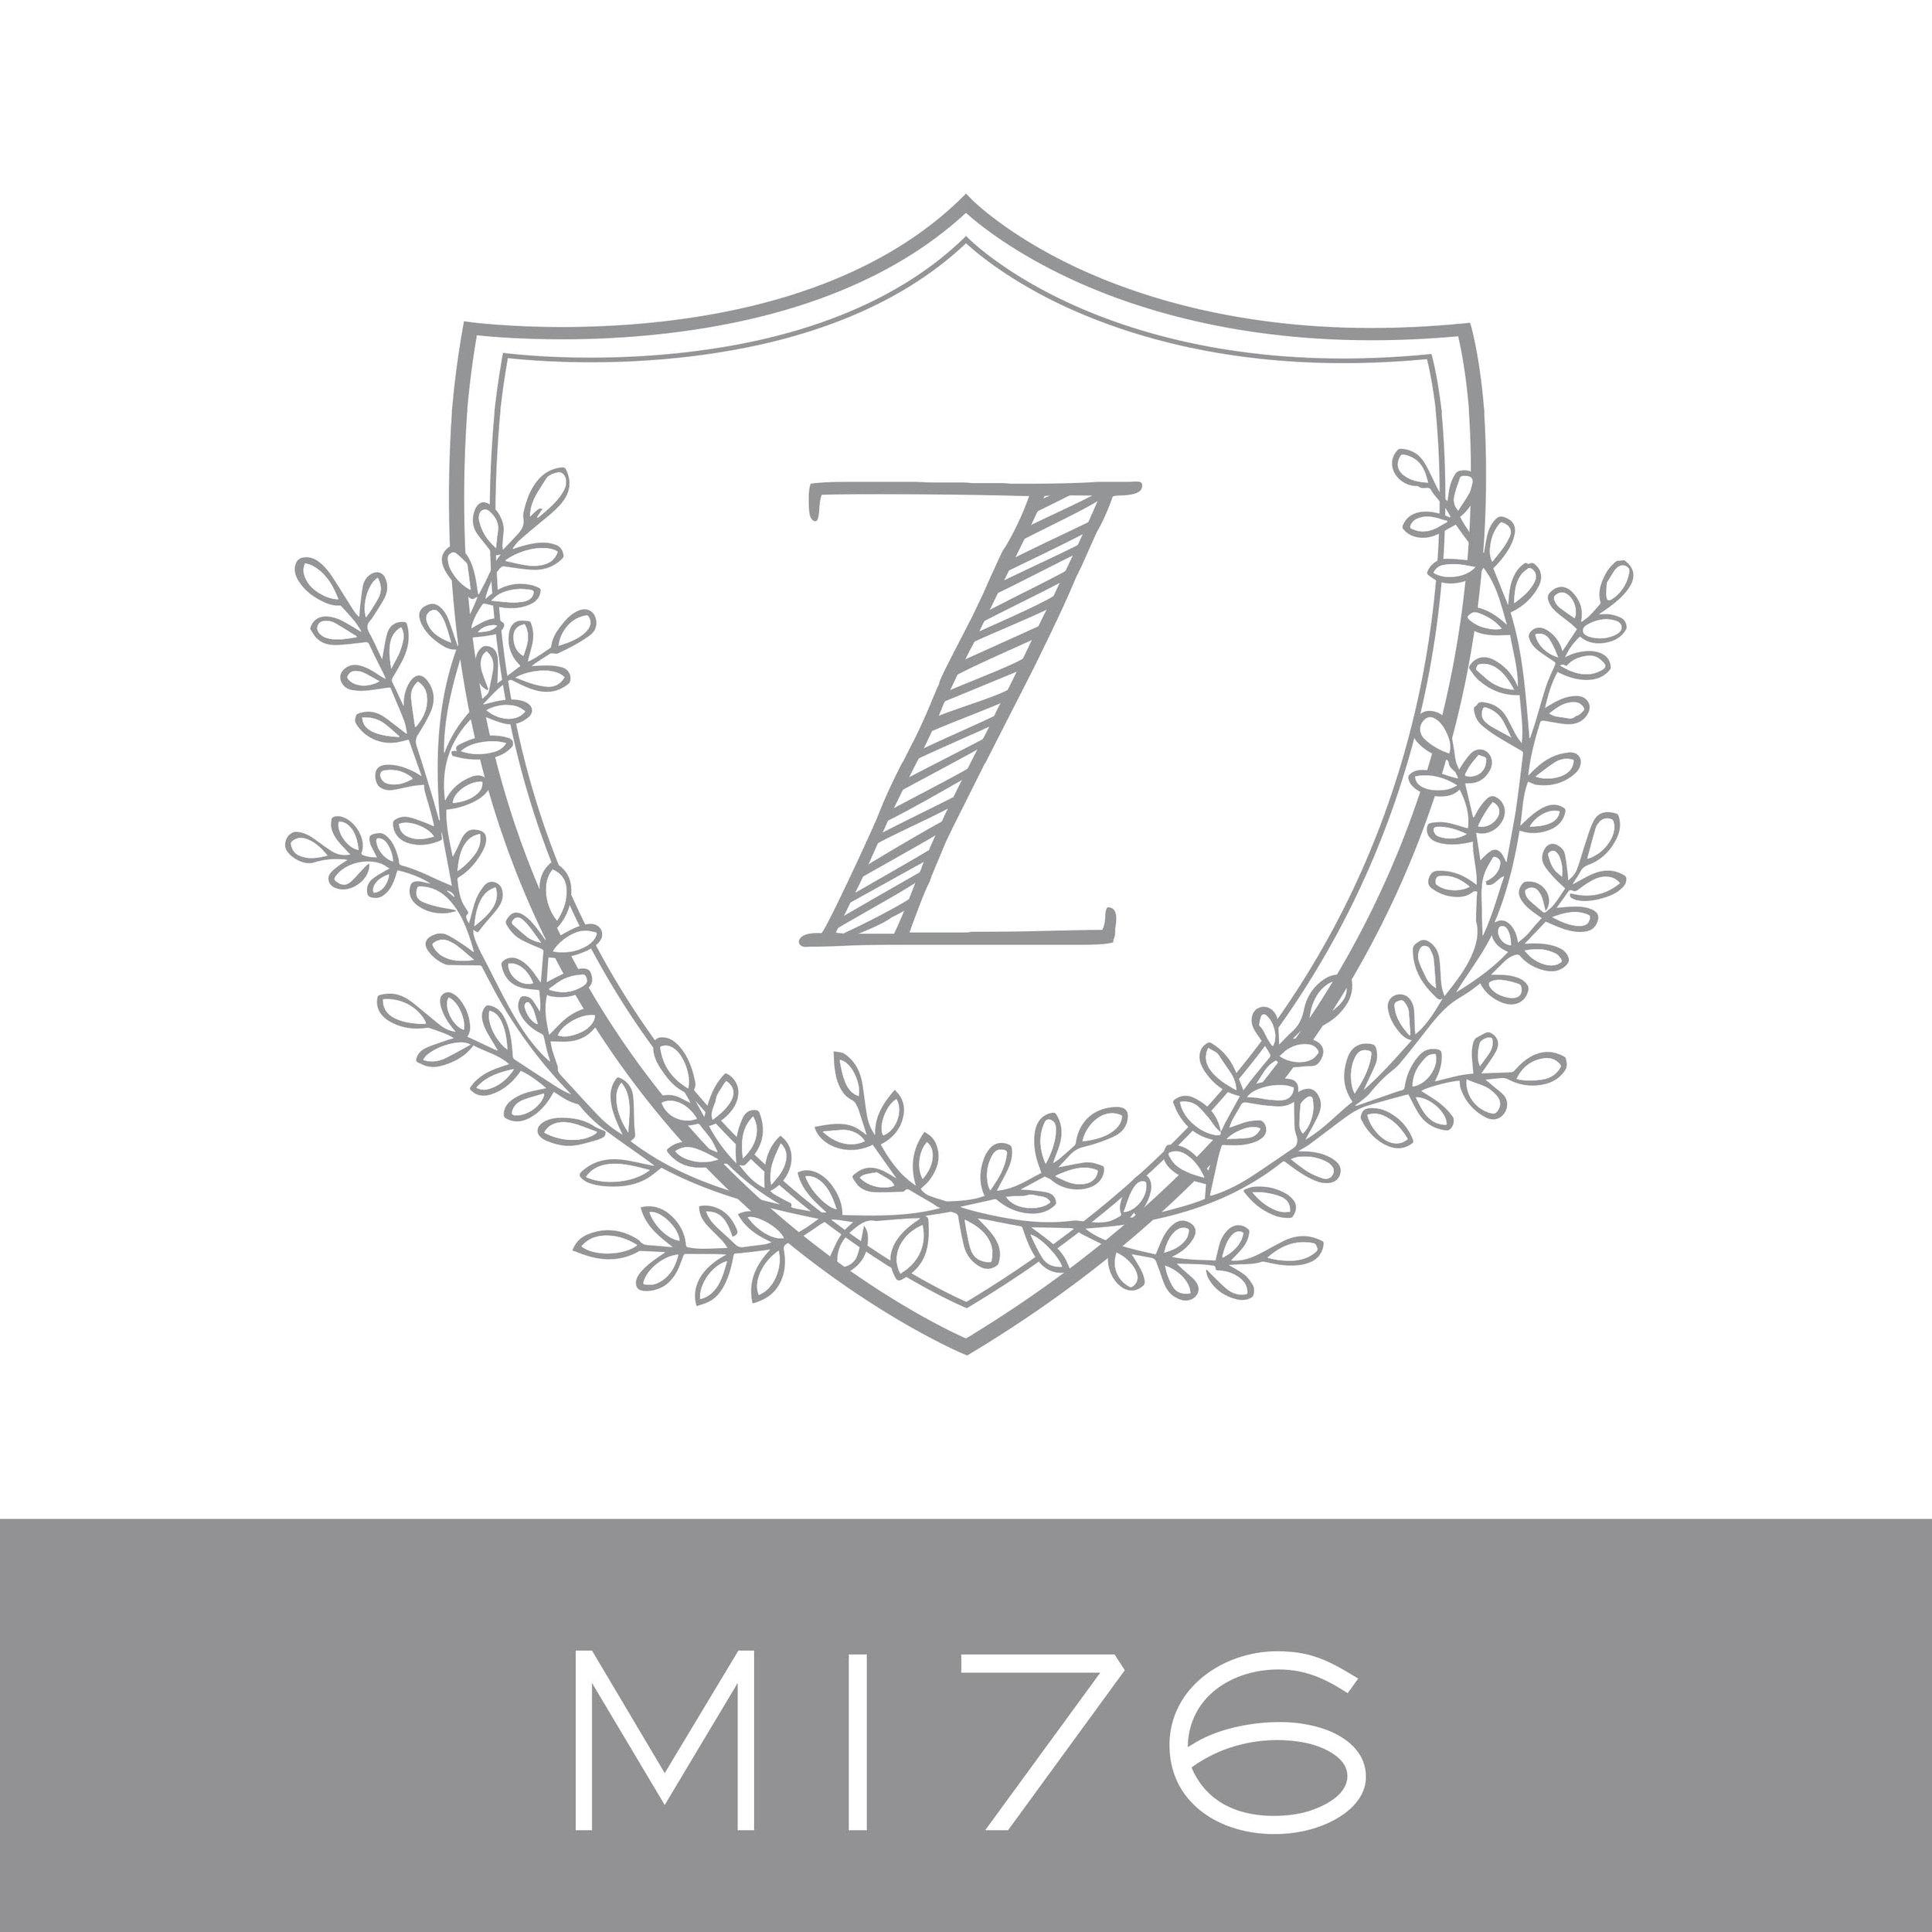 M176.jpg